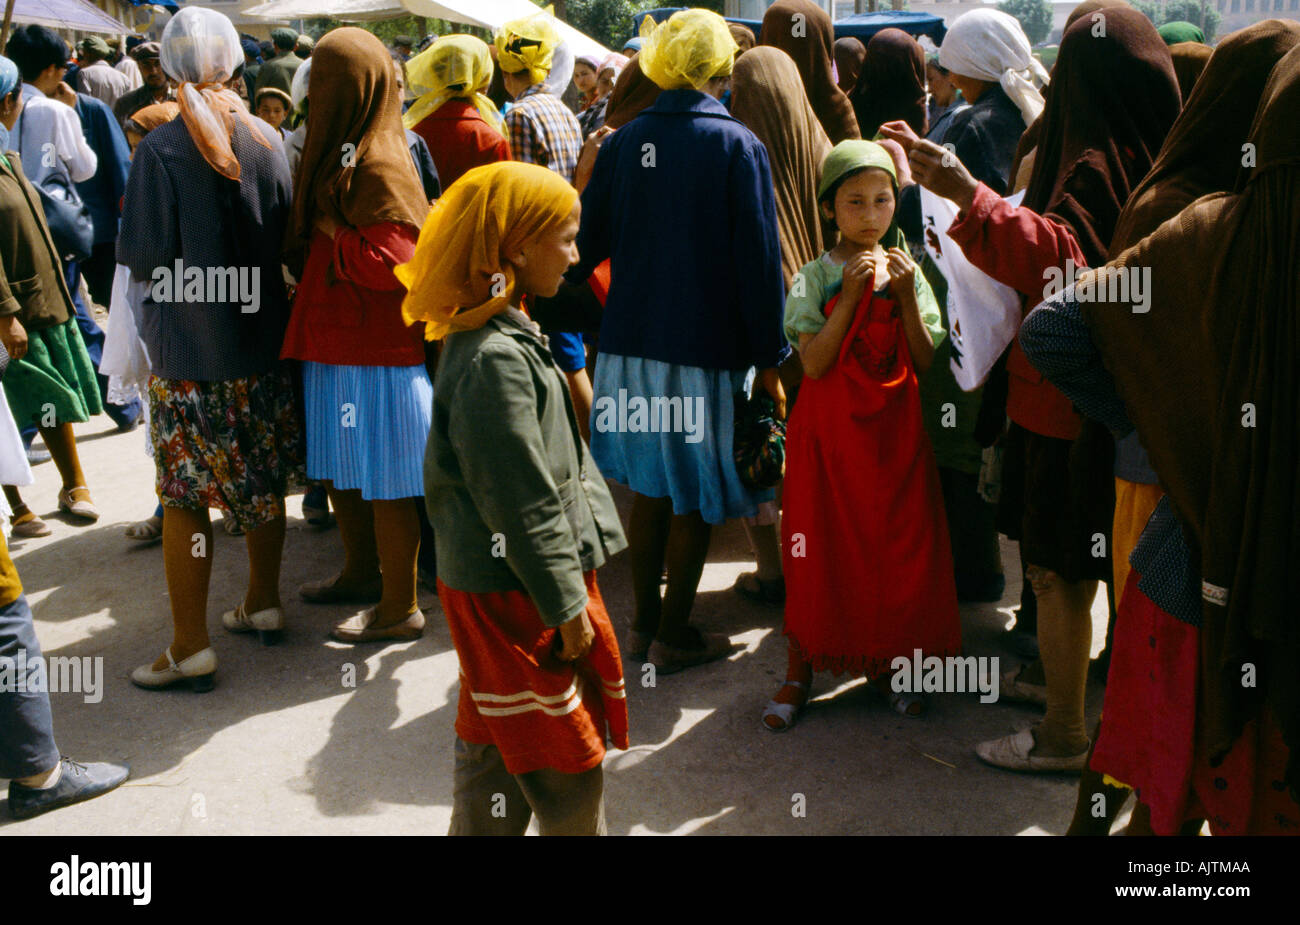 Xinjiag China Kashi Bazaar Women And Children Uygar Muslims - Stock Image